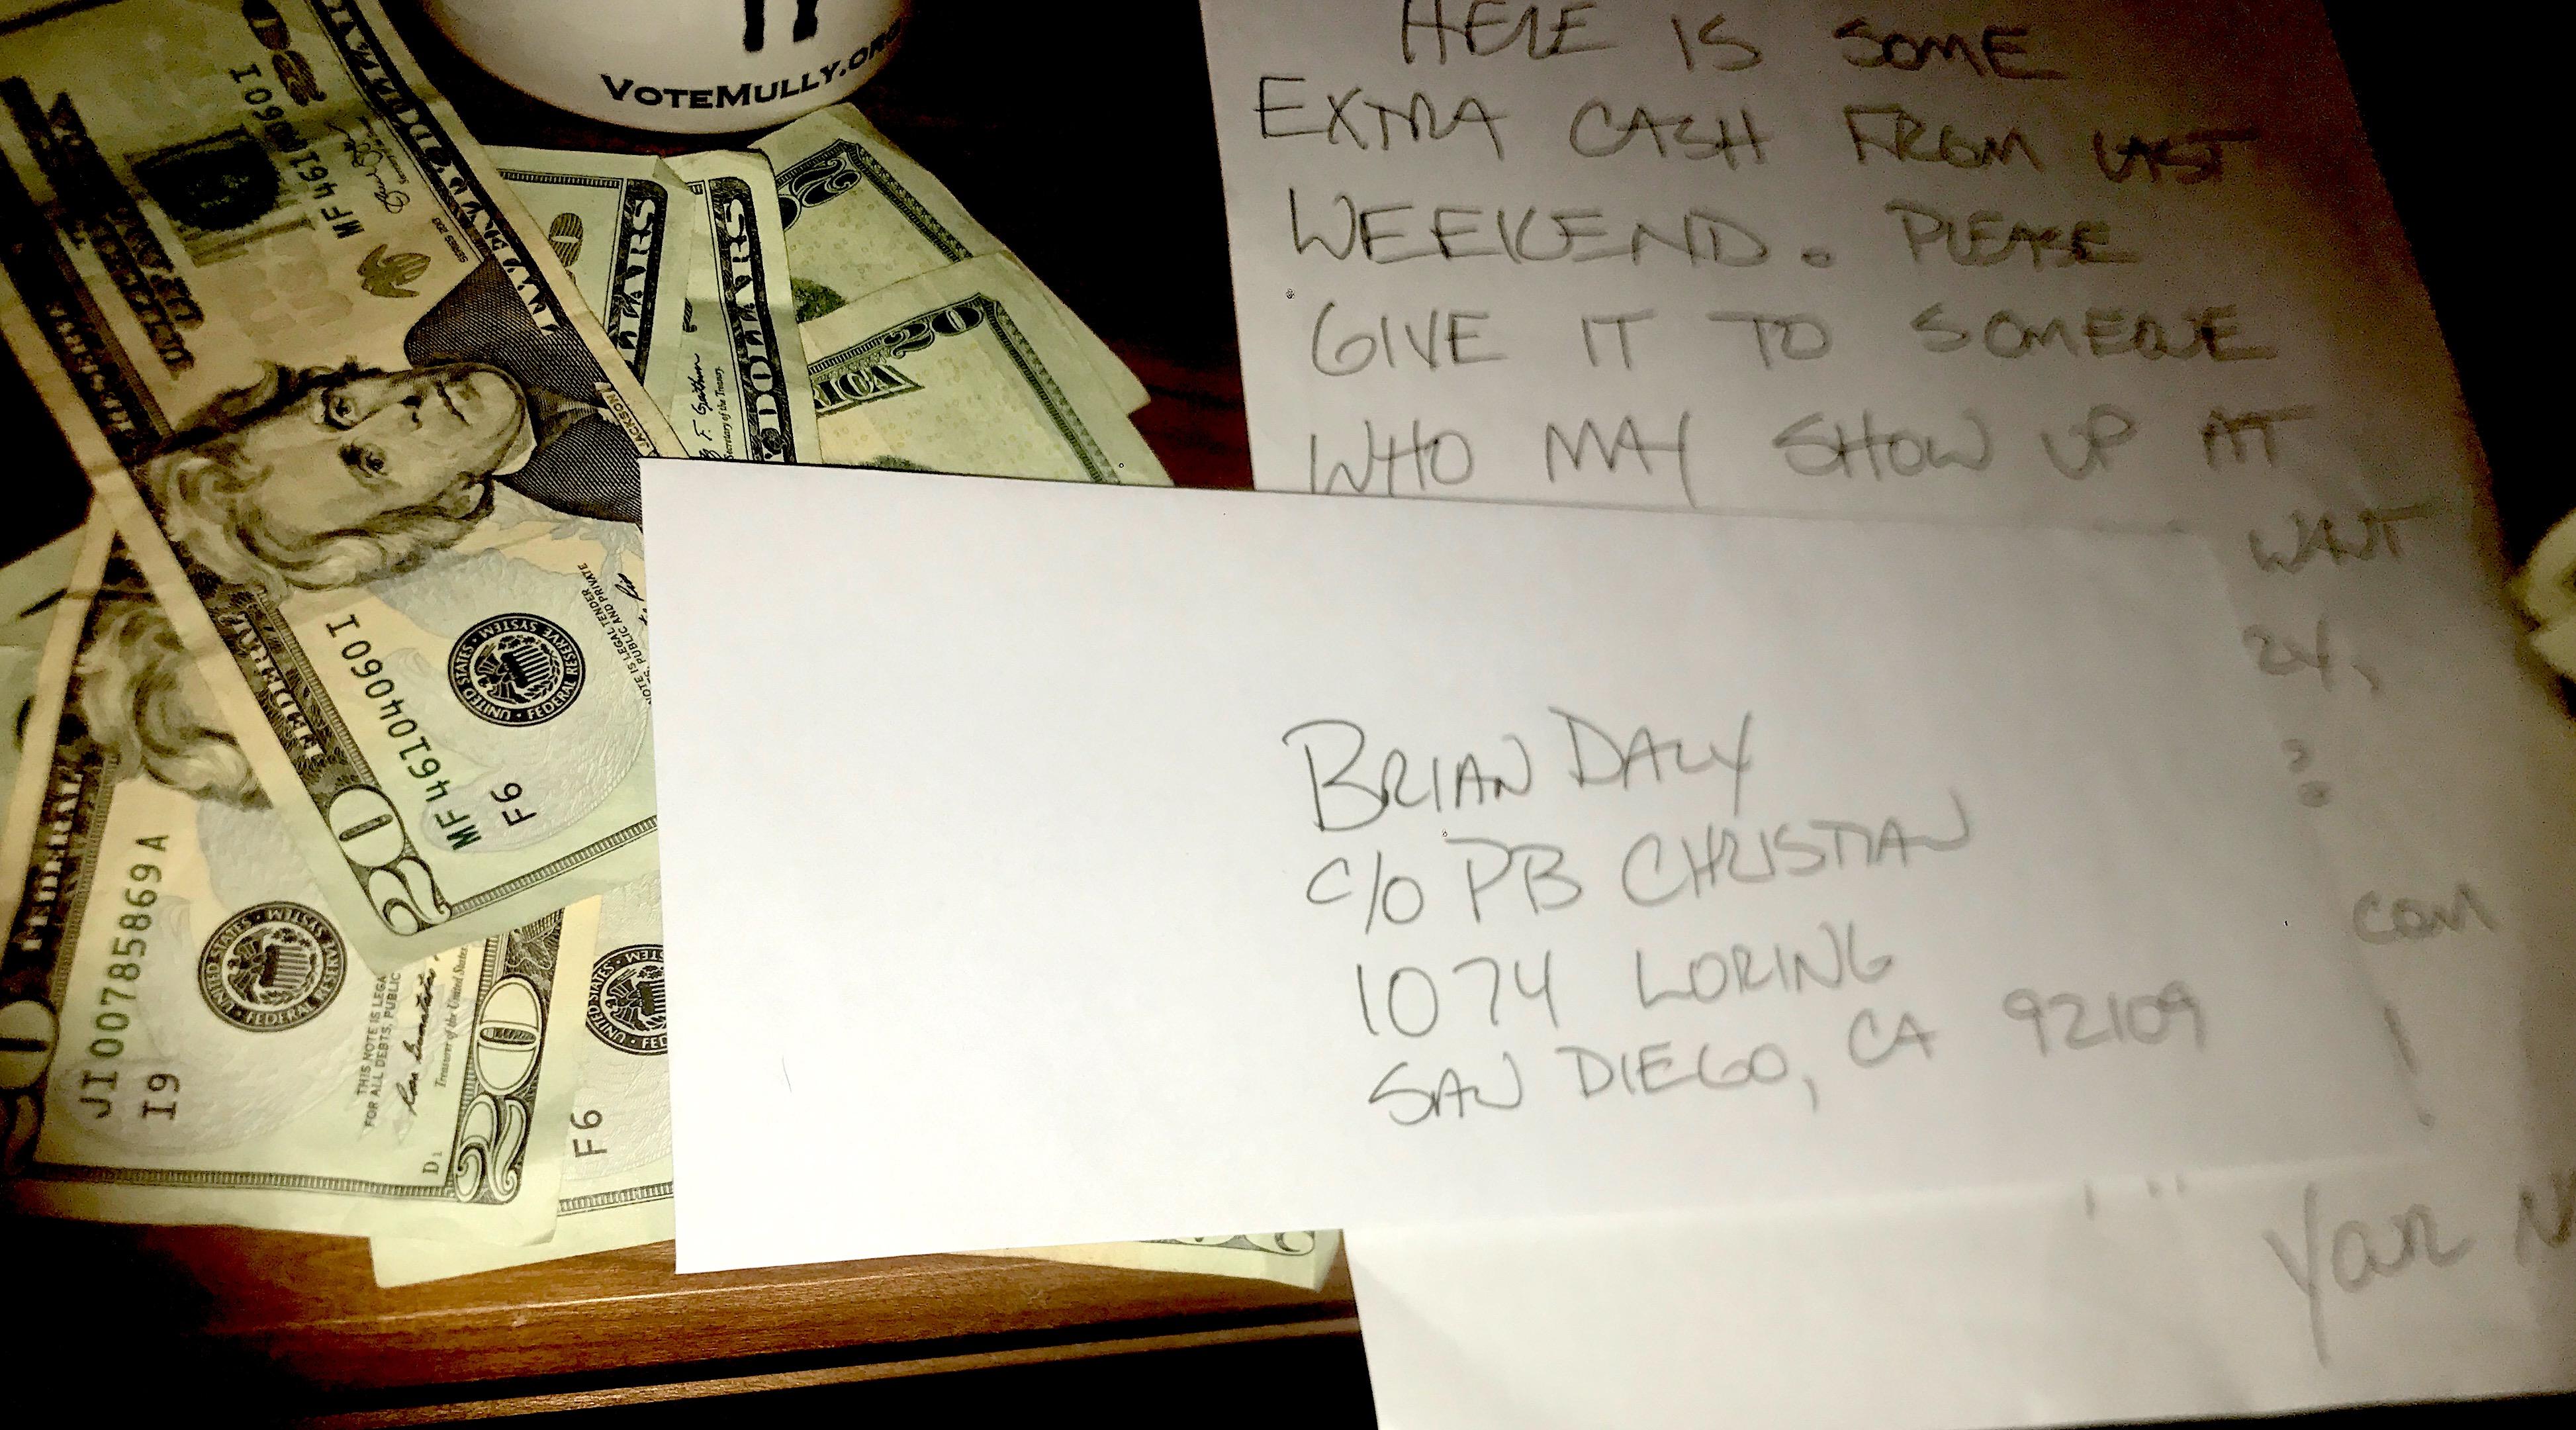 brian daly envelope